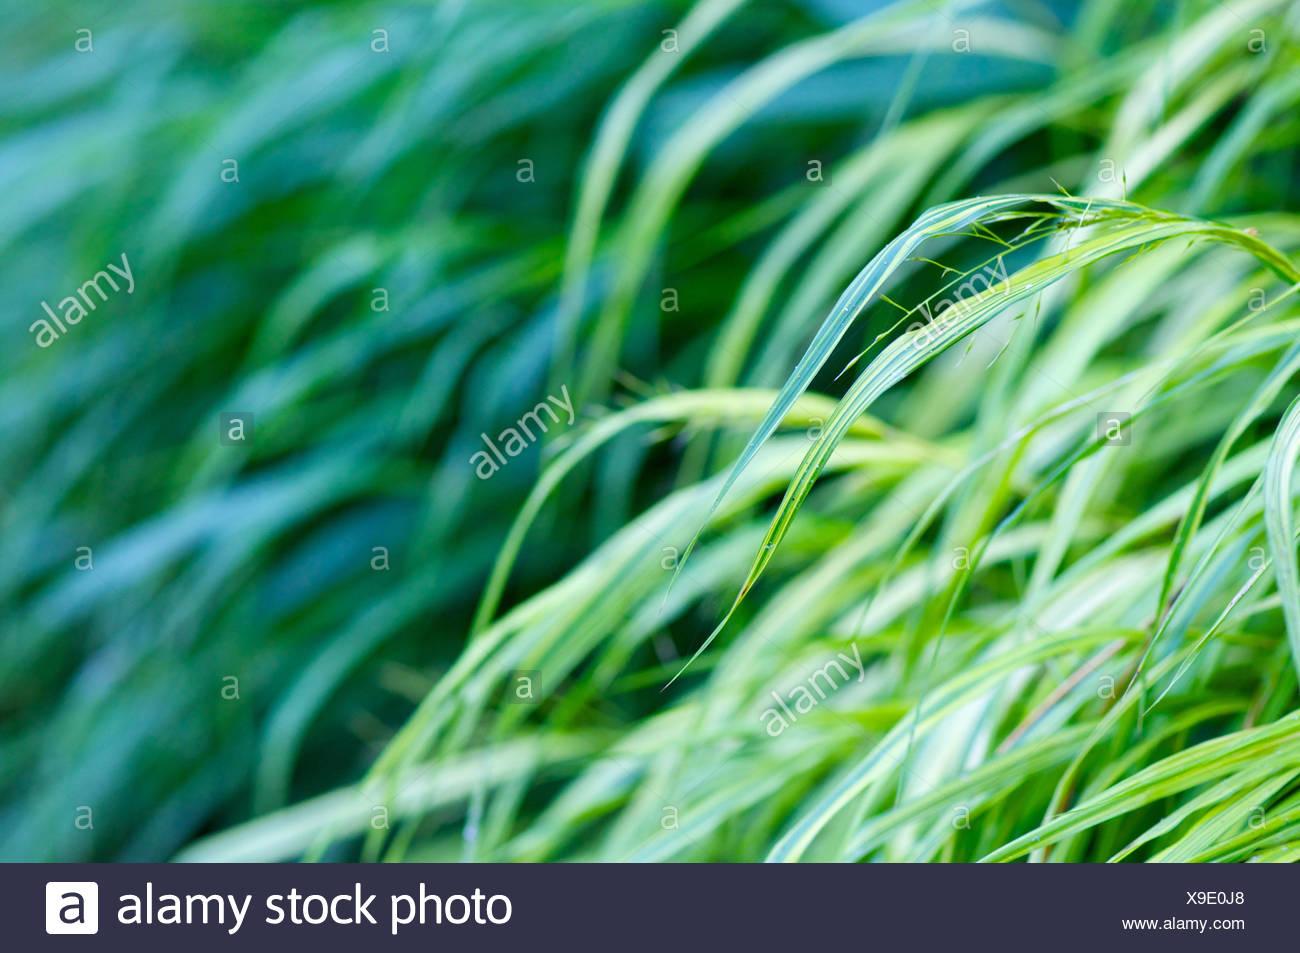 Grasses, blur, detail, - Stock Image